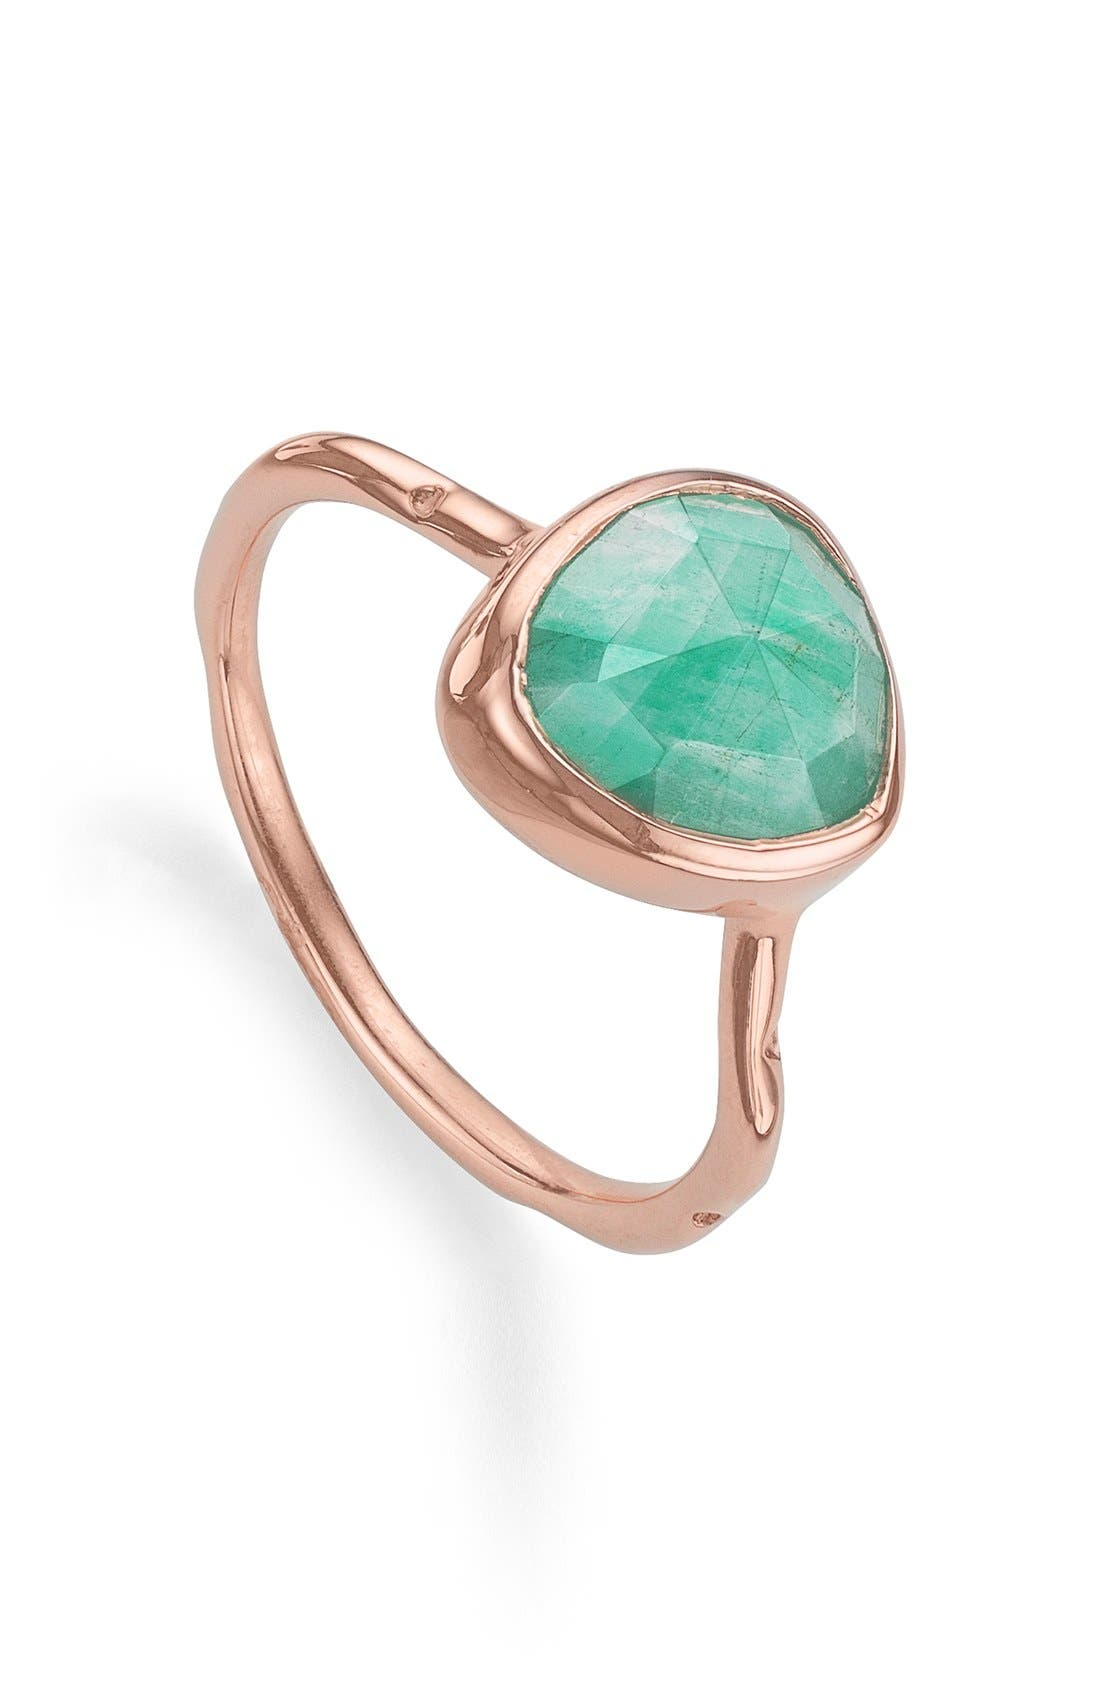 Main Image - Monica Vinader Siren Semiprecious Stone Stacking Ring